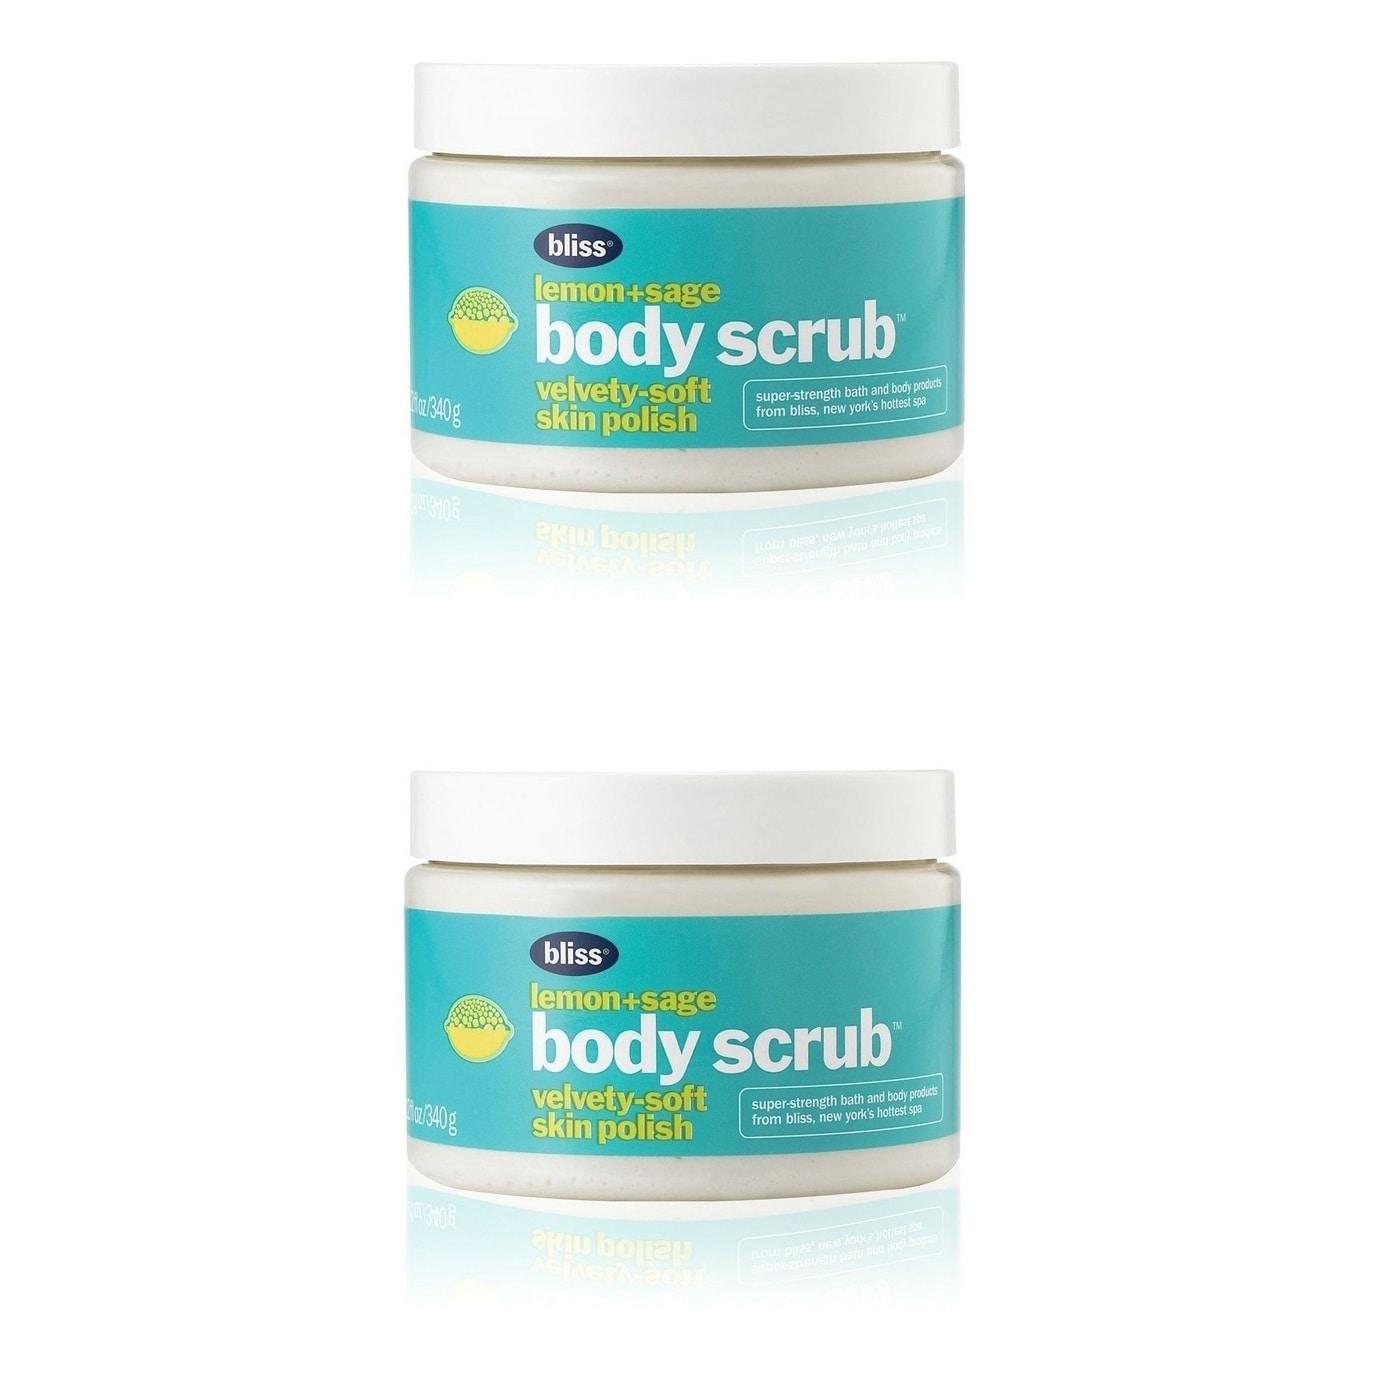 Bliss Lemon+Sage 12.1-ounce Body Scrub Vevety-Soft Skin Polish ...